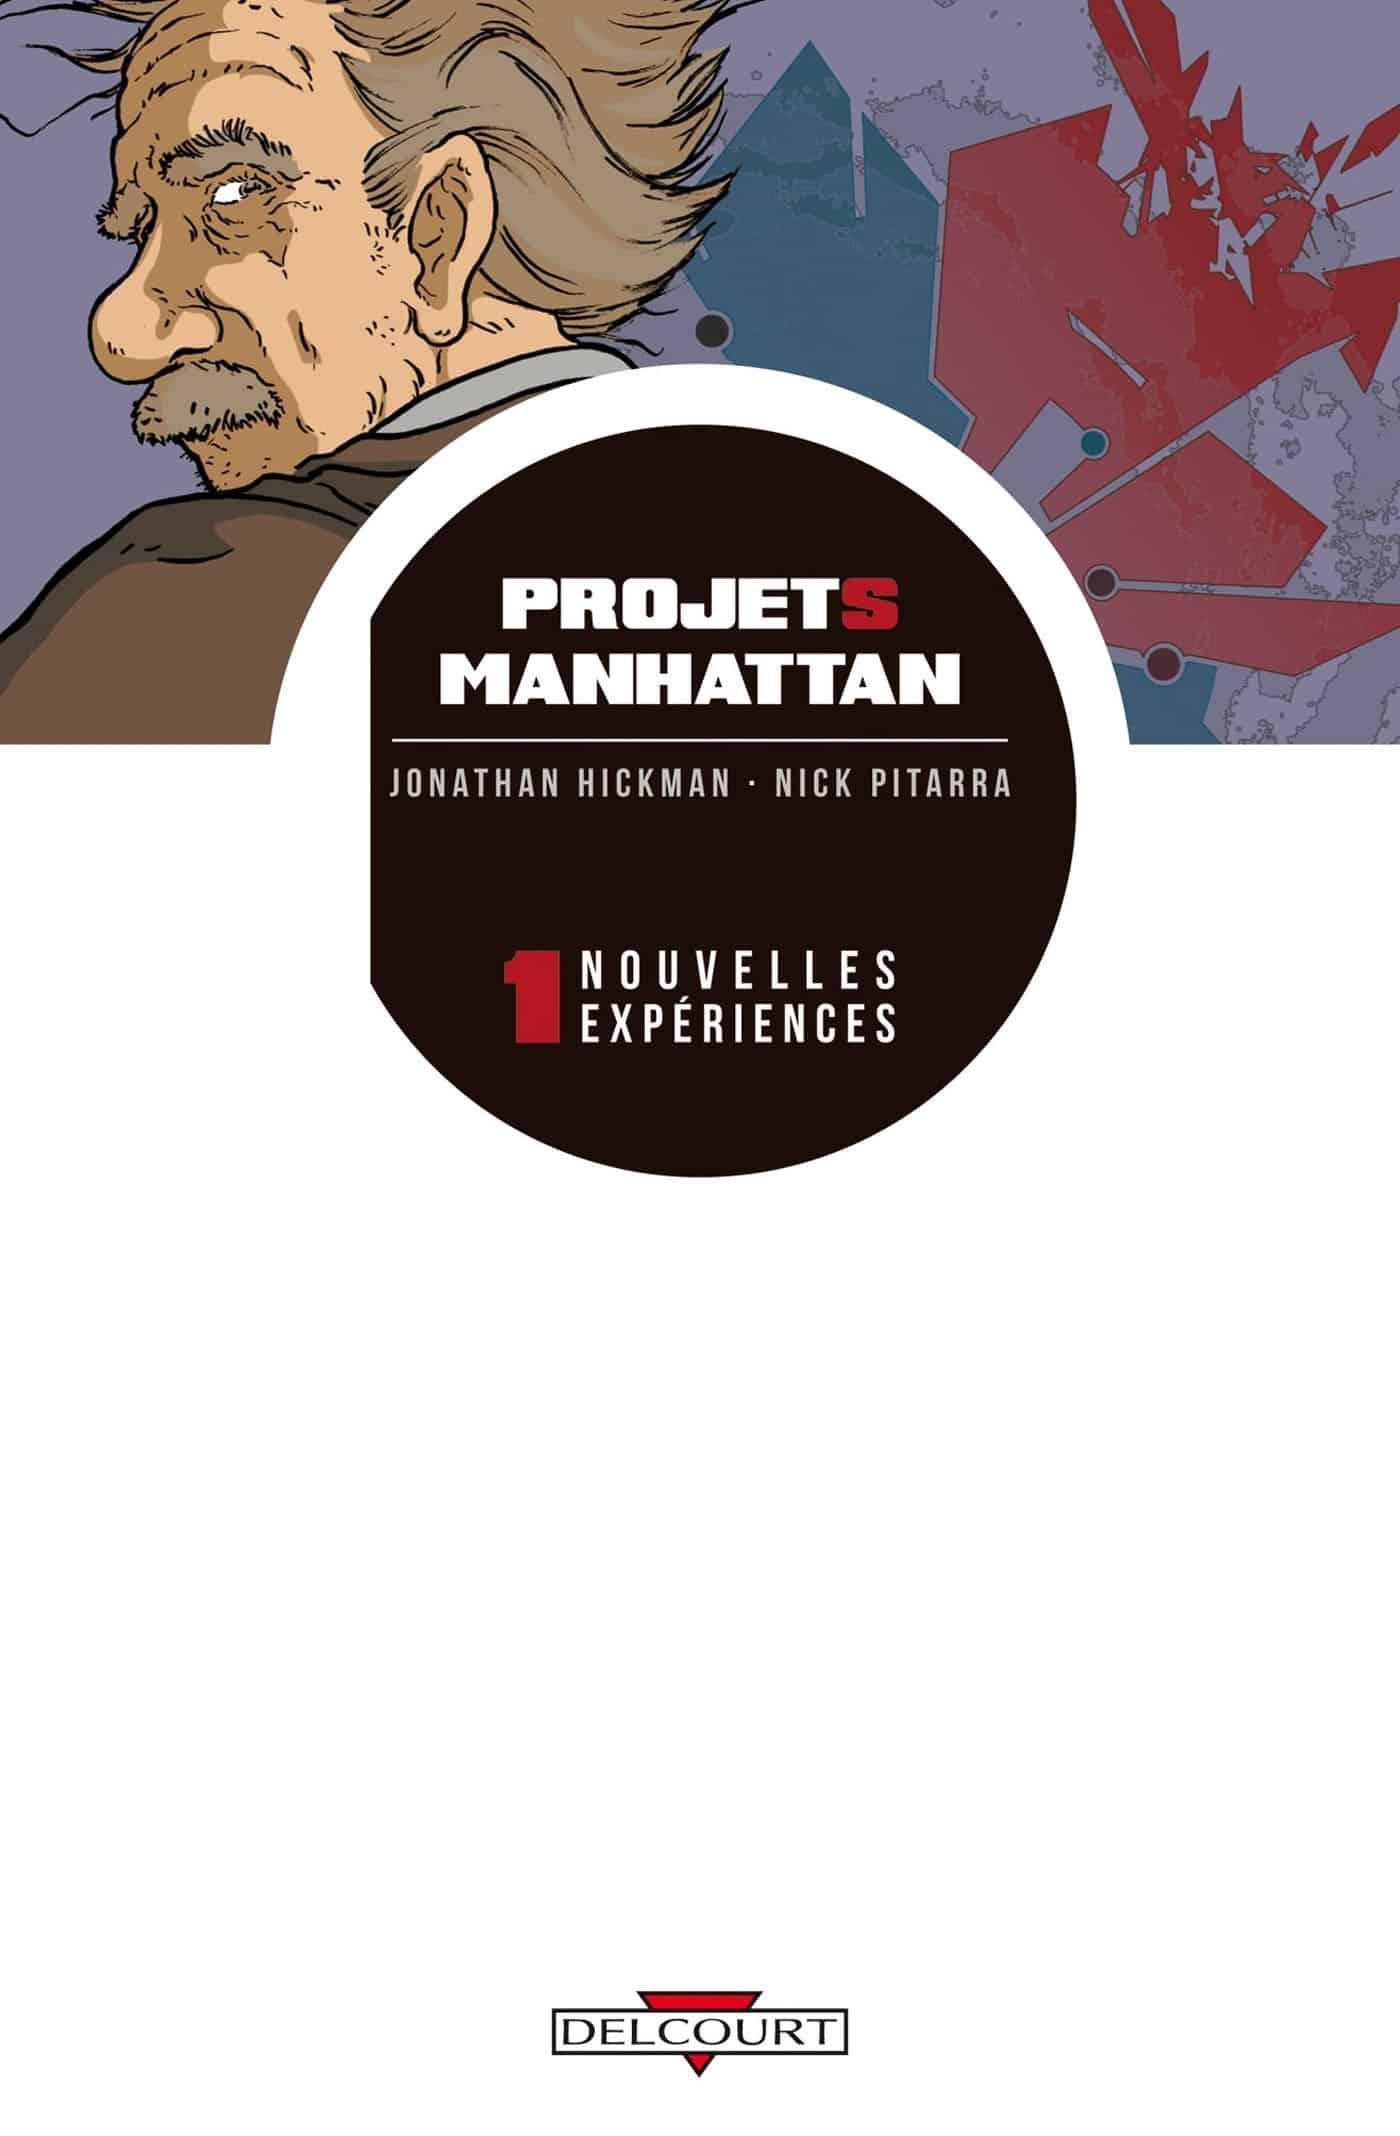 Projets Manhattan, les terrifiants projets du Dr Oppenheimer